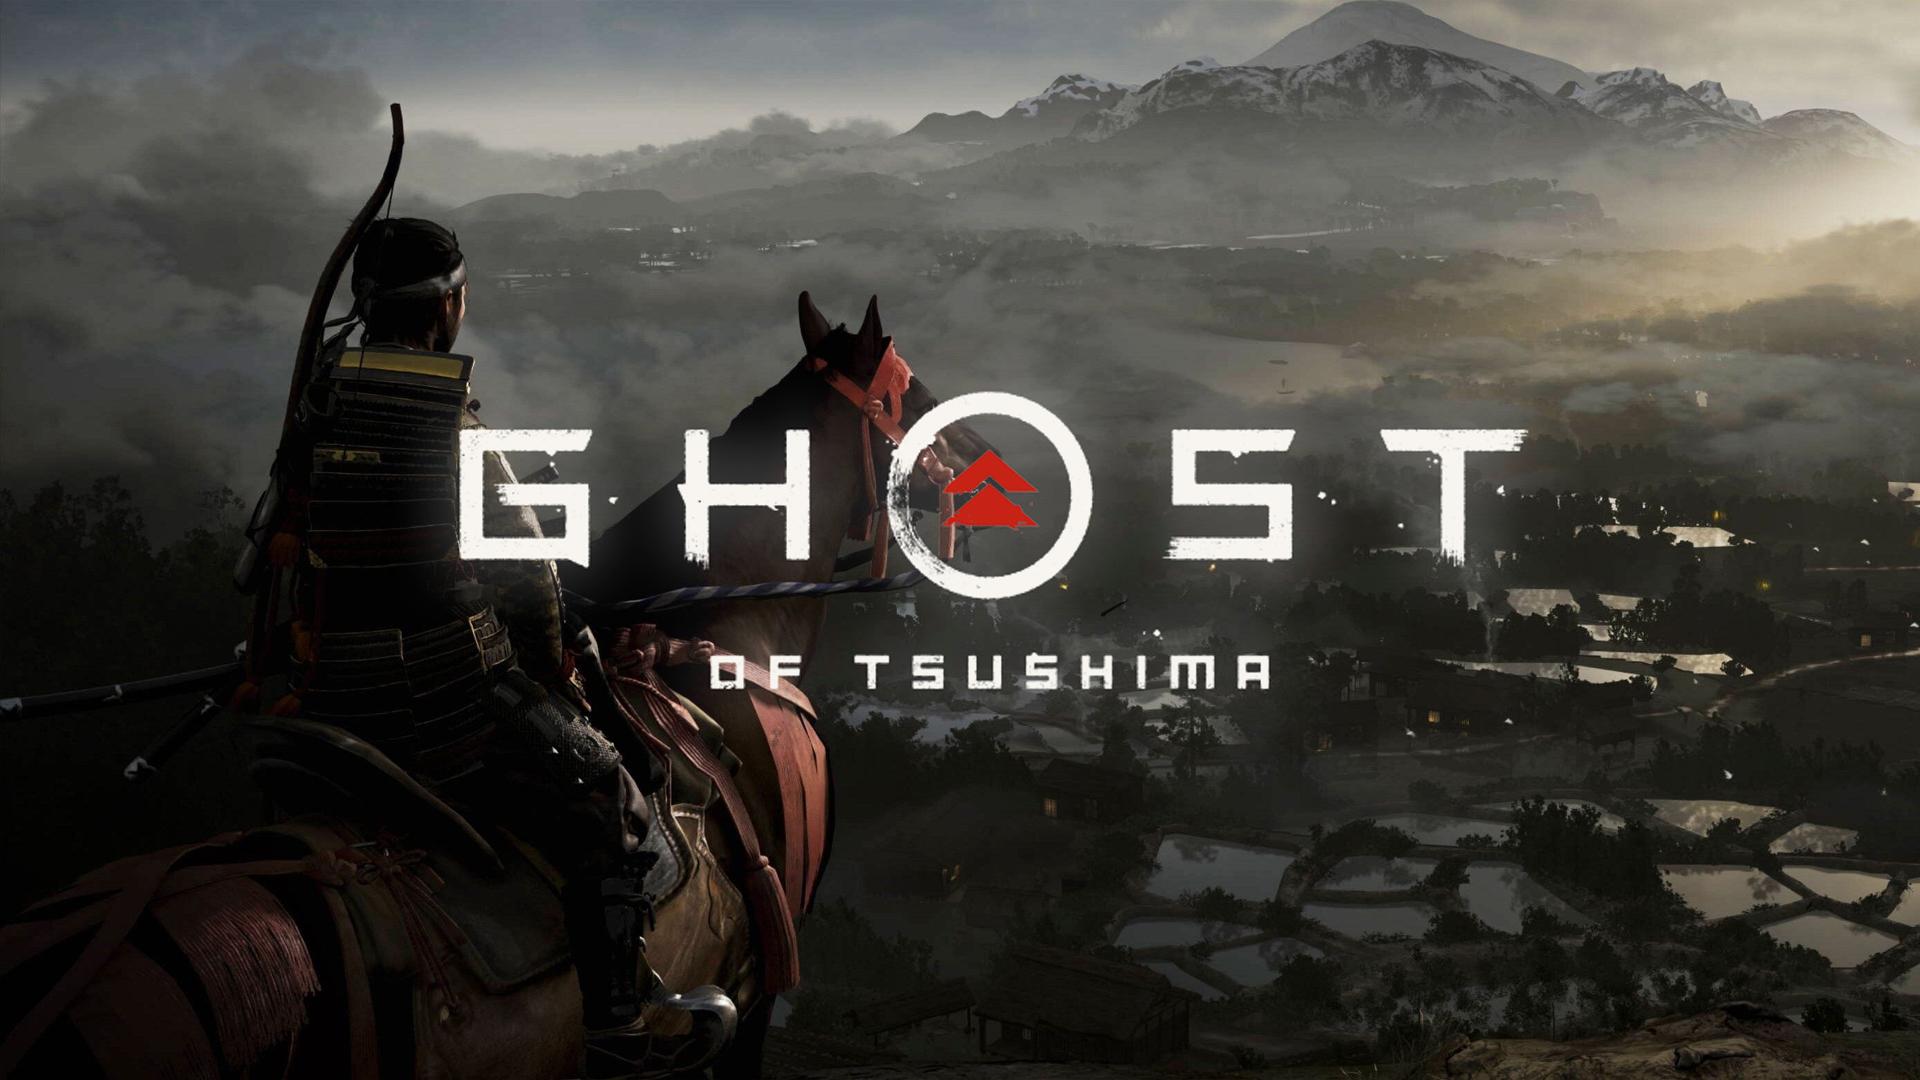 Ghost of Tsushima Wallpaper